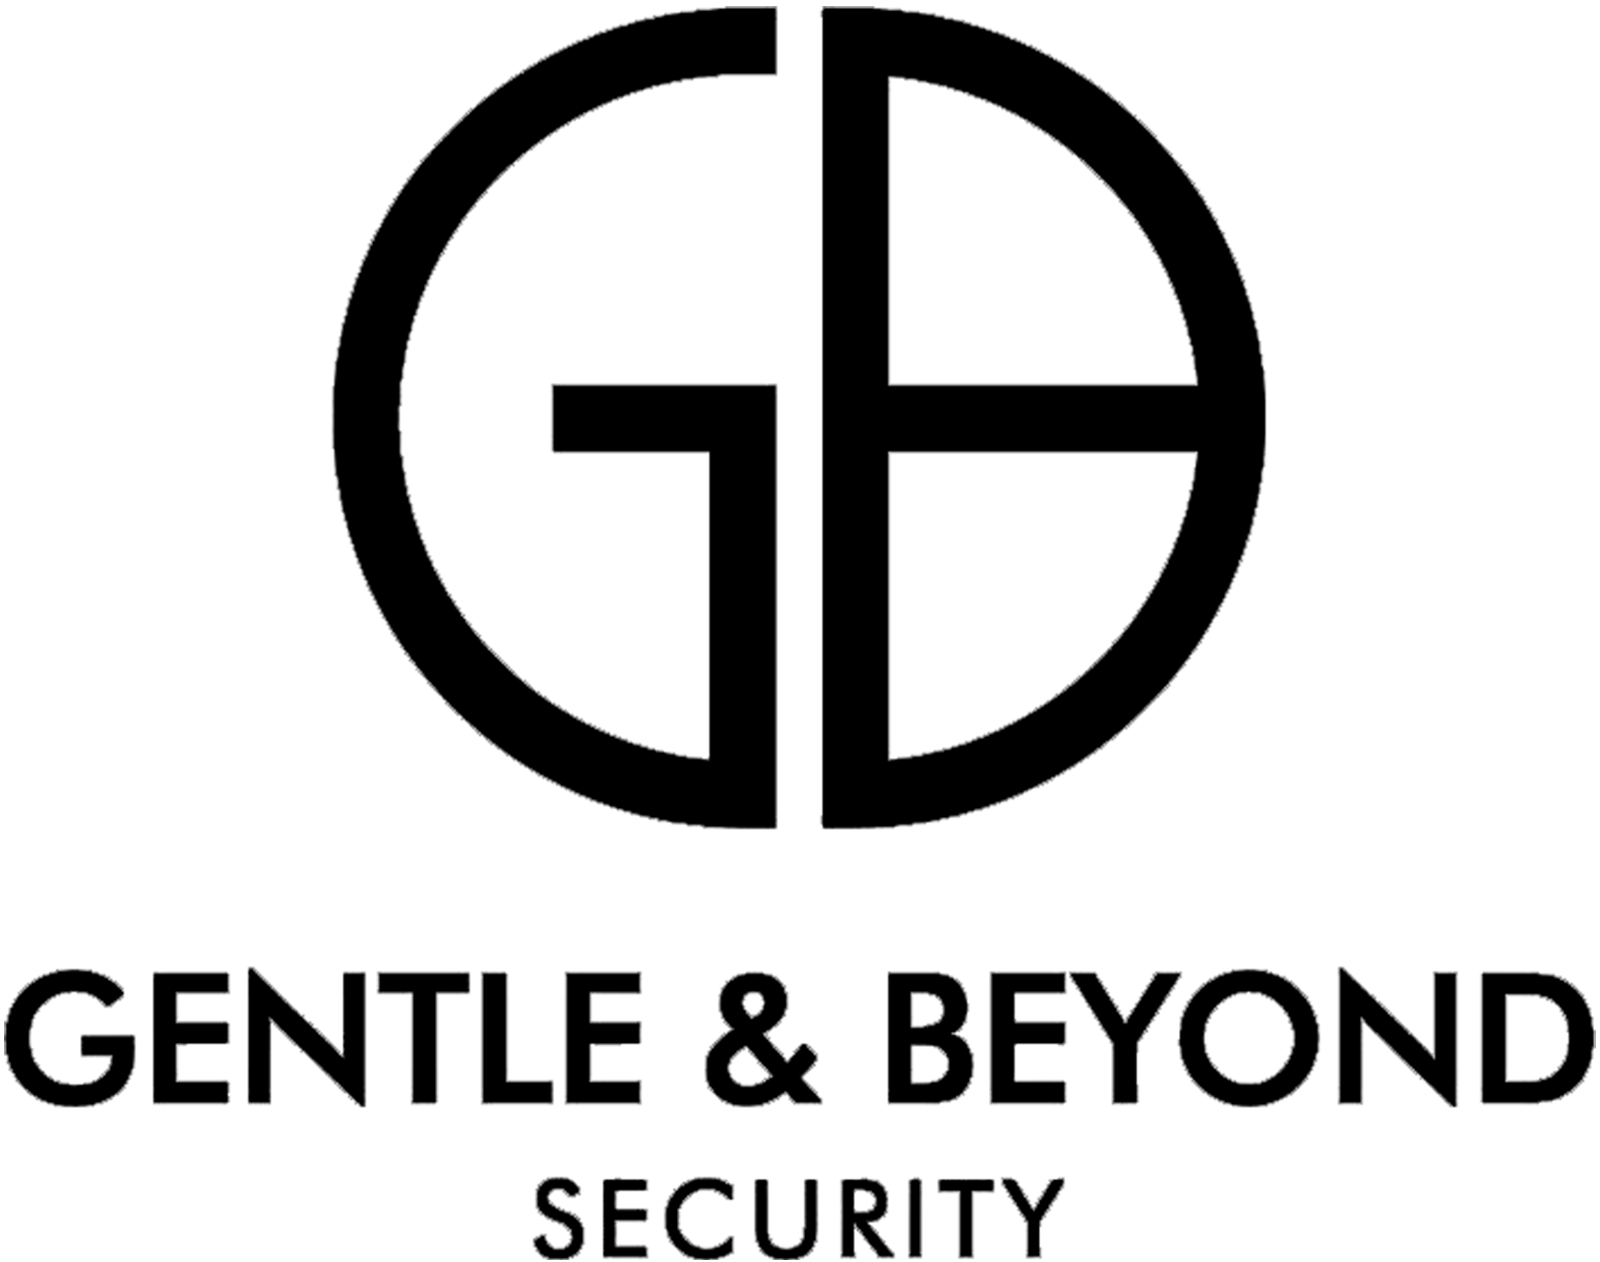 gb zwart logo x